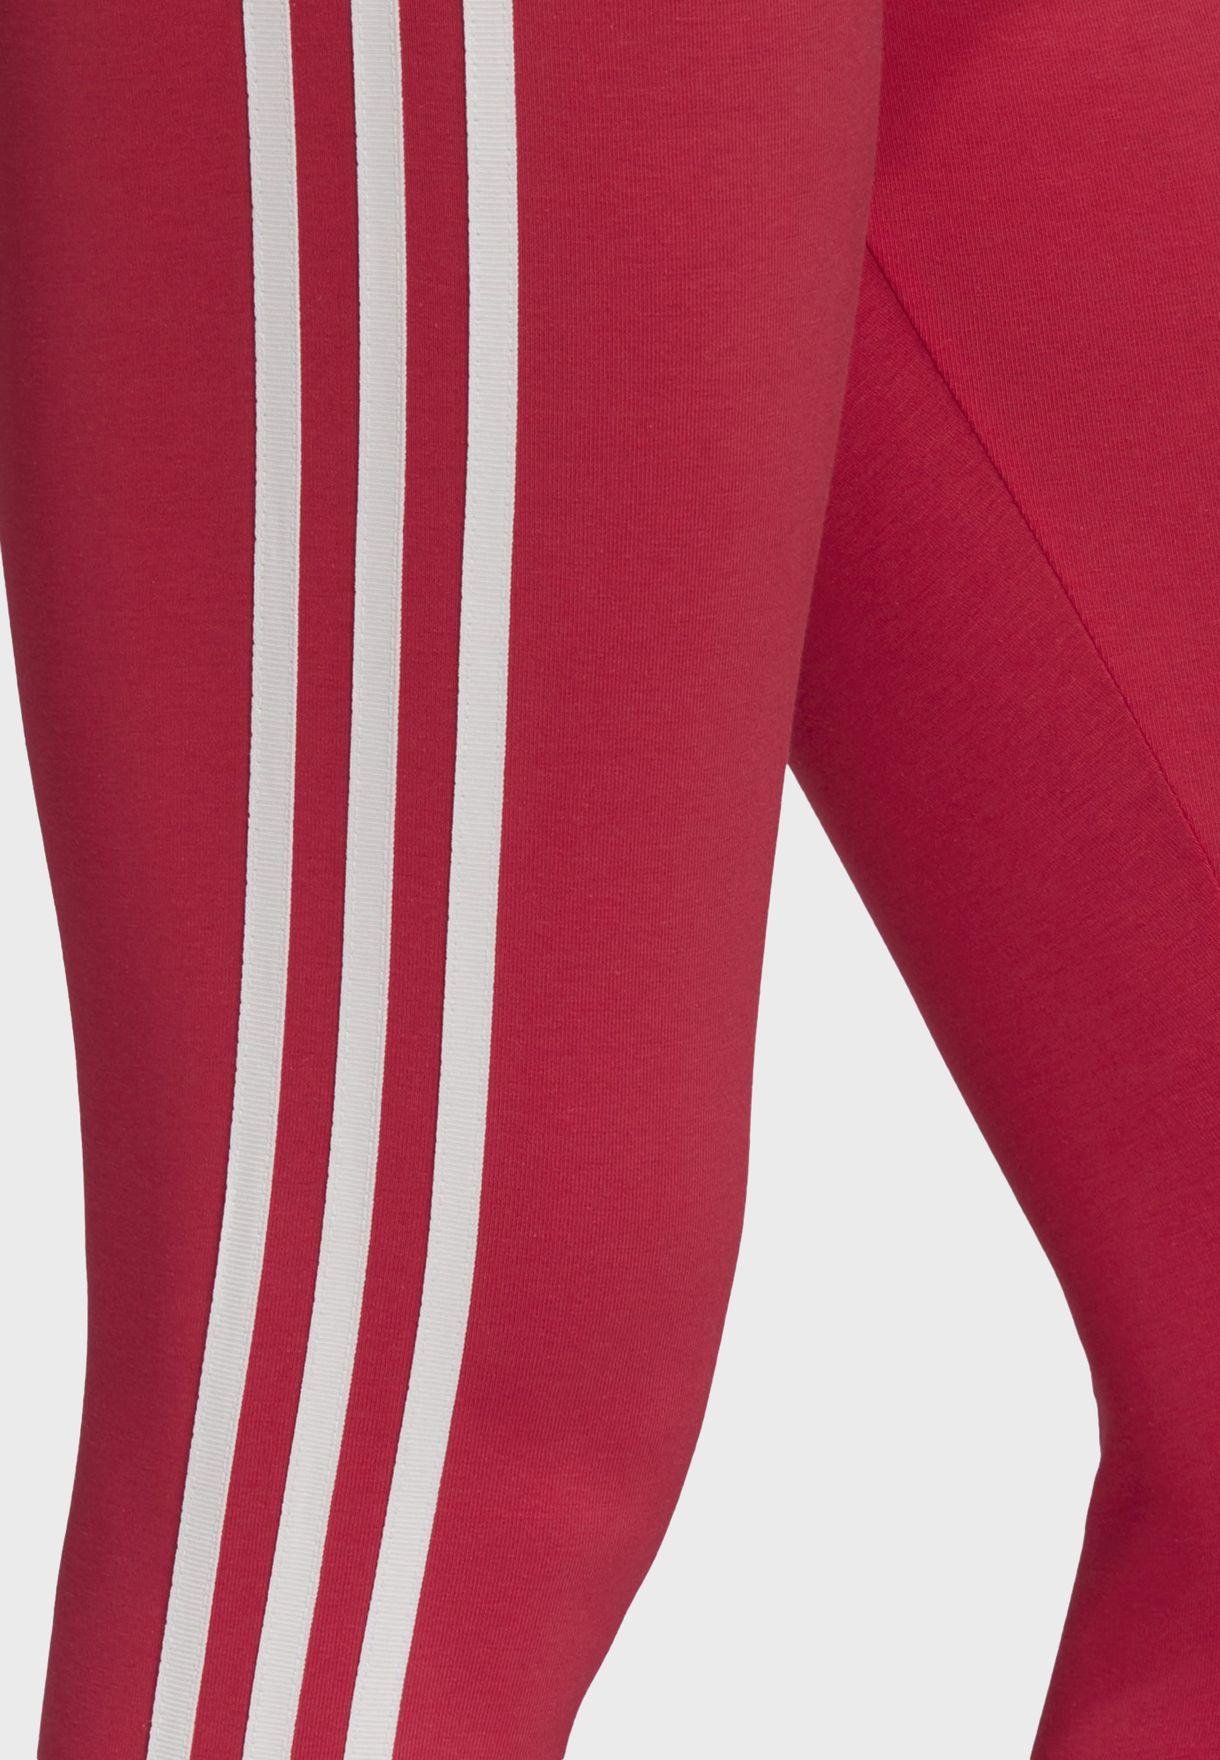 3 Stripes Adicolor Casual Women's Leggings